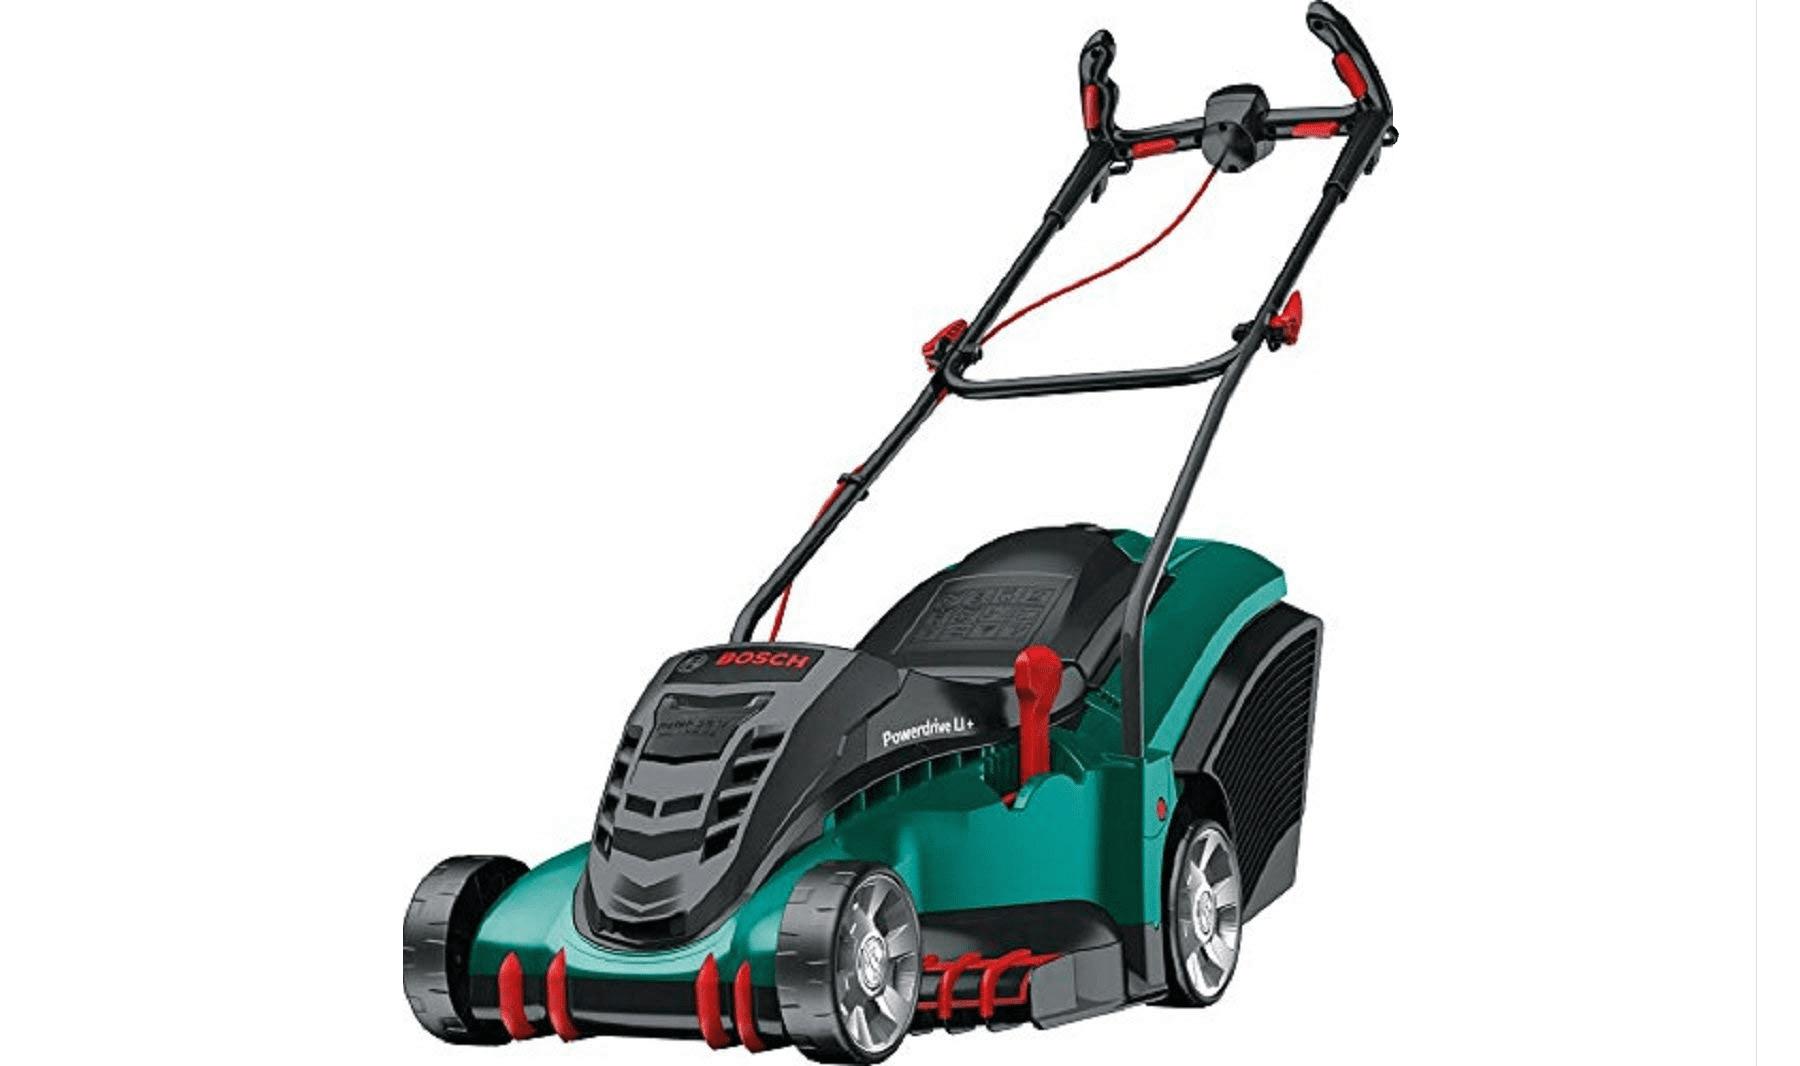 Bosch Rotak 430 LI Cordless Lawnmower